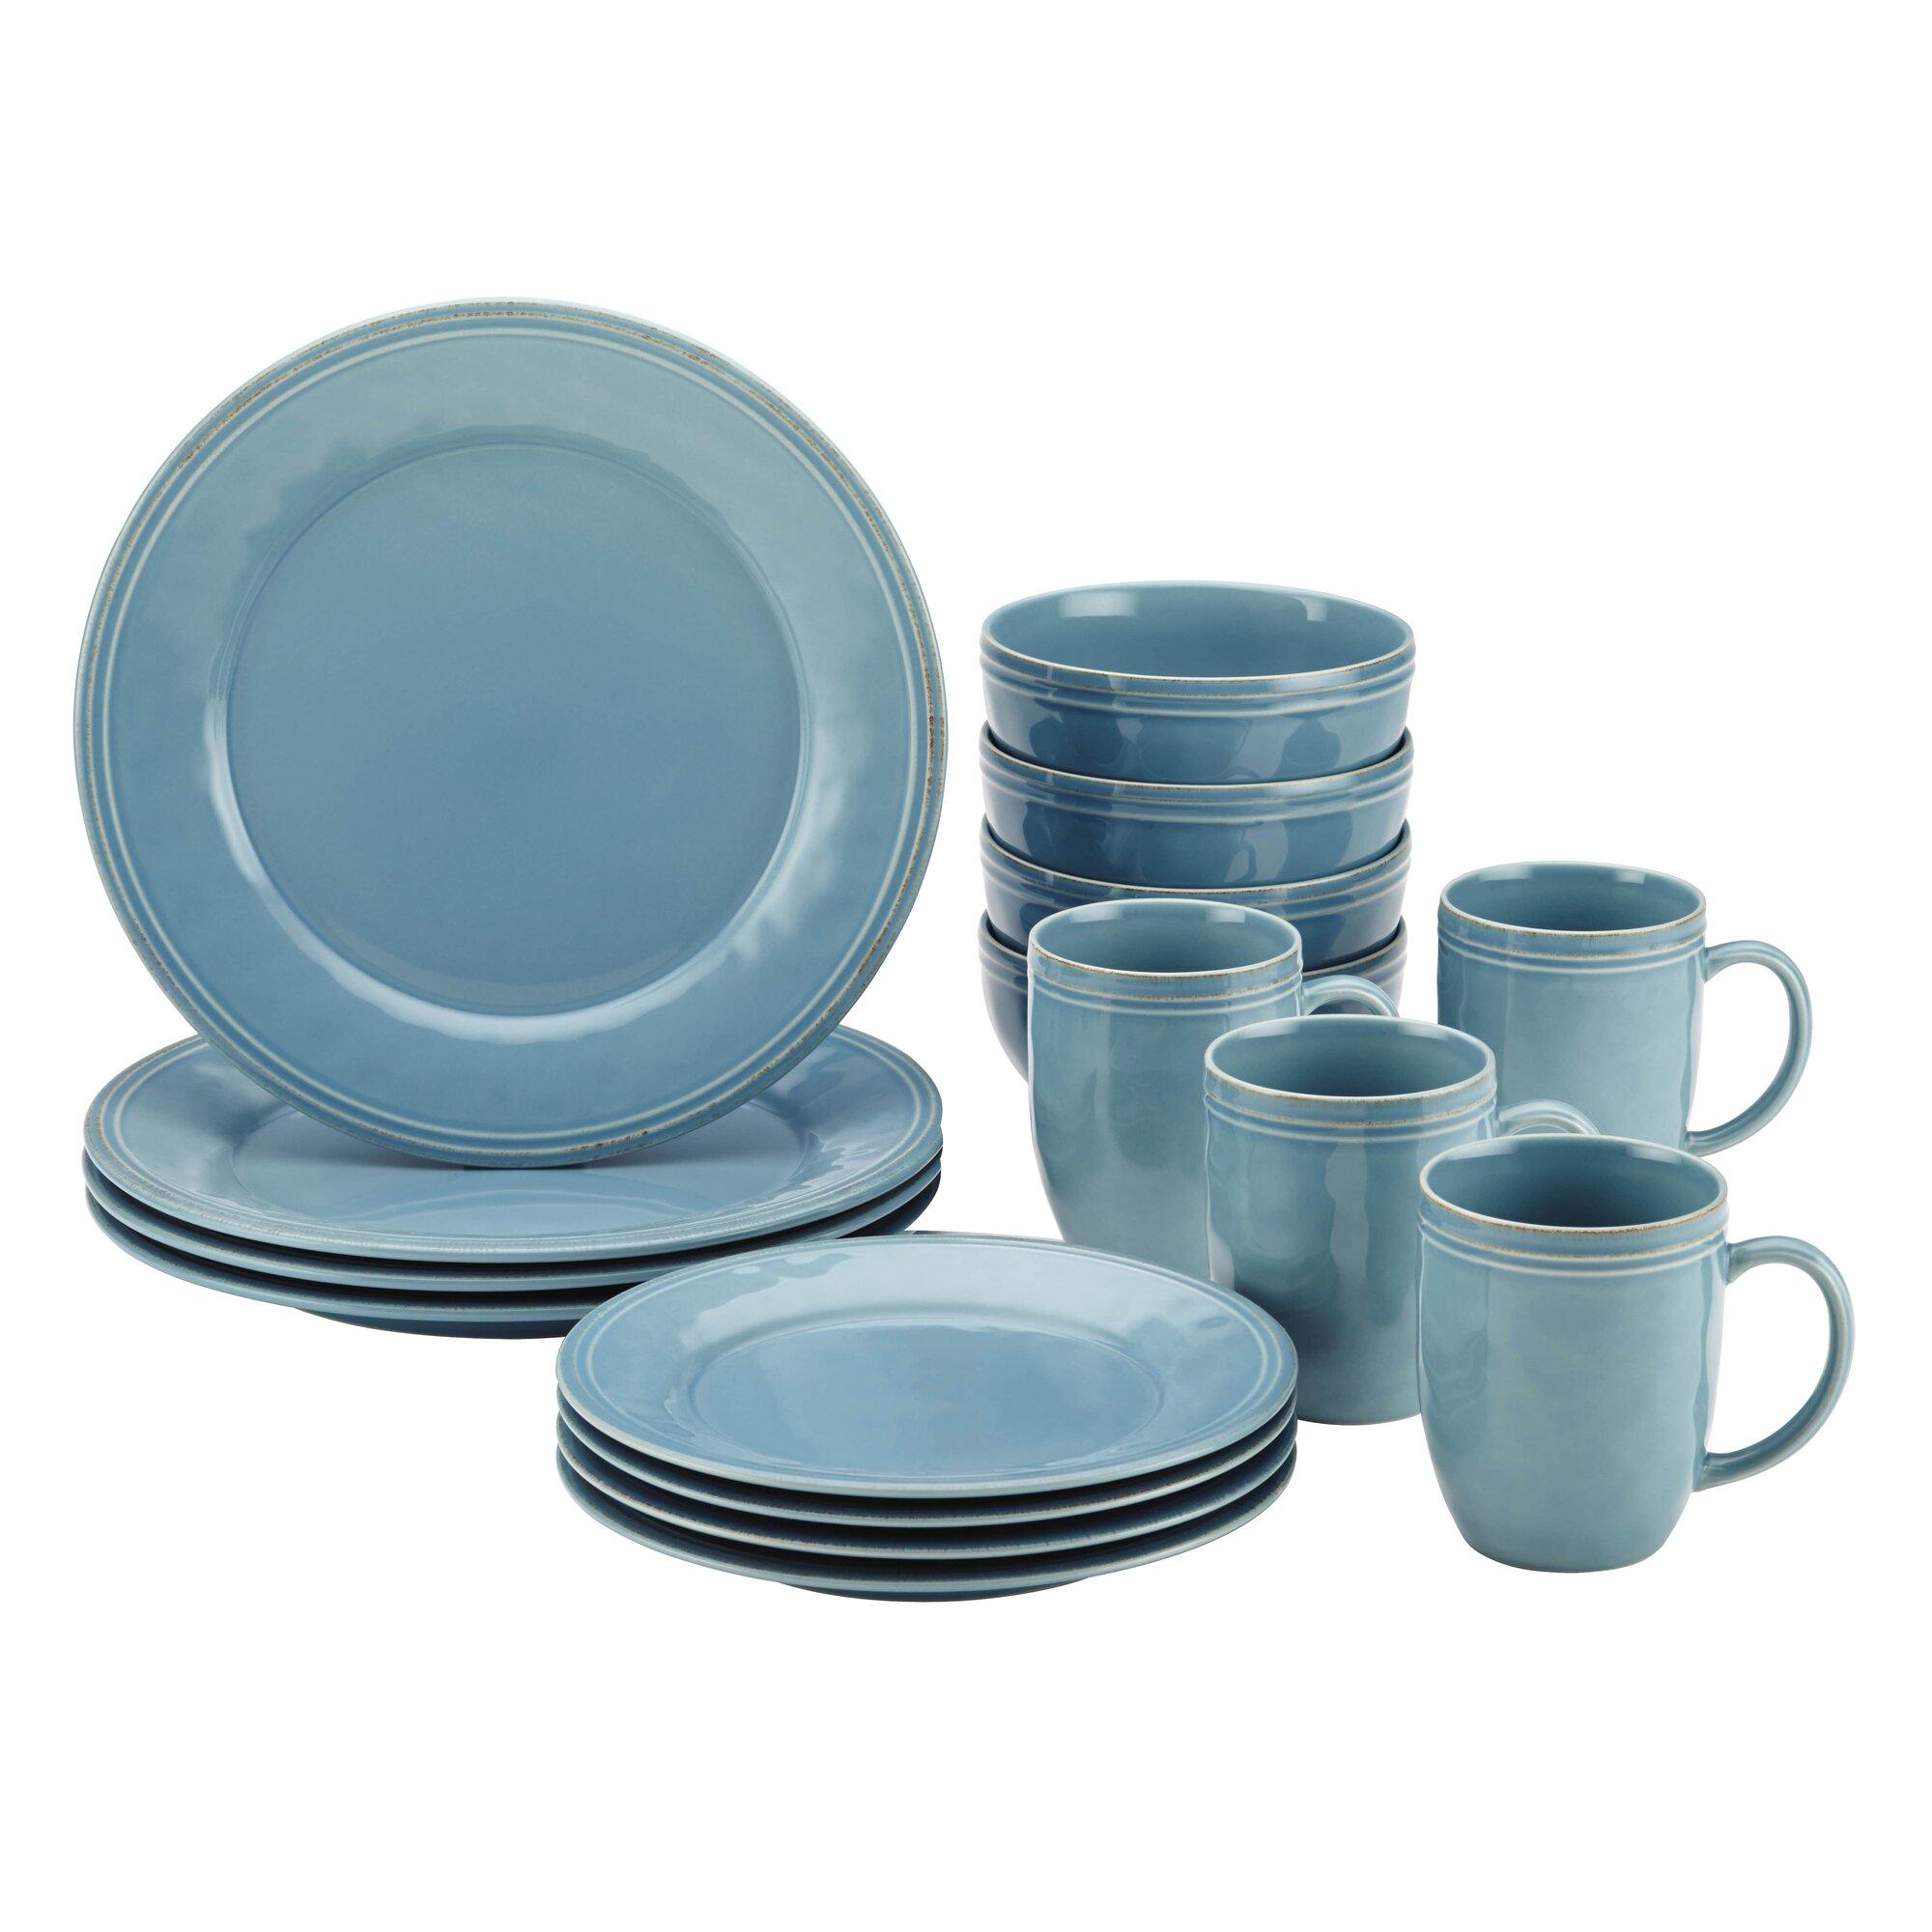 Rachael Ray Cucina 16 Piece Dinnerware Set, Service for 4 ...